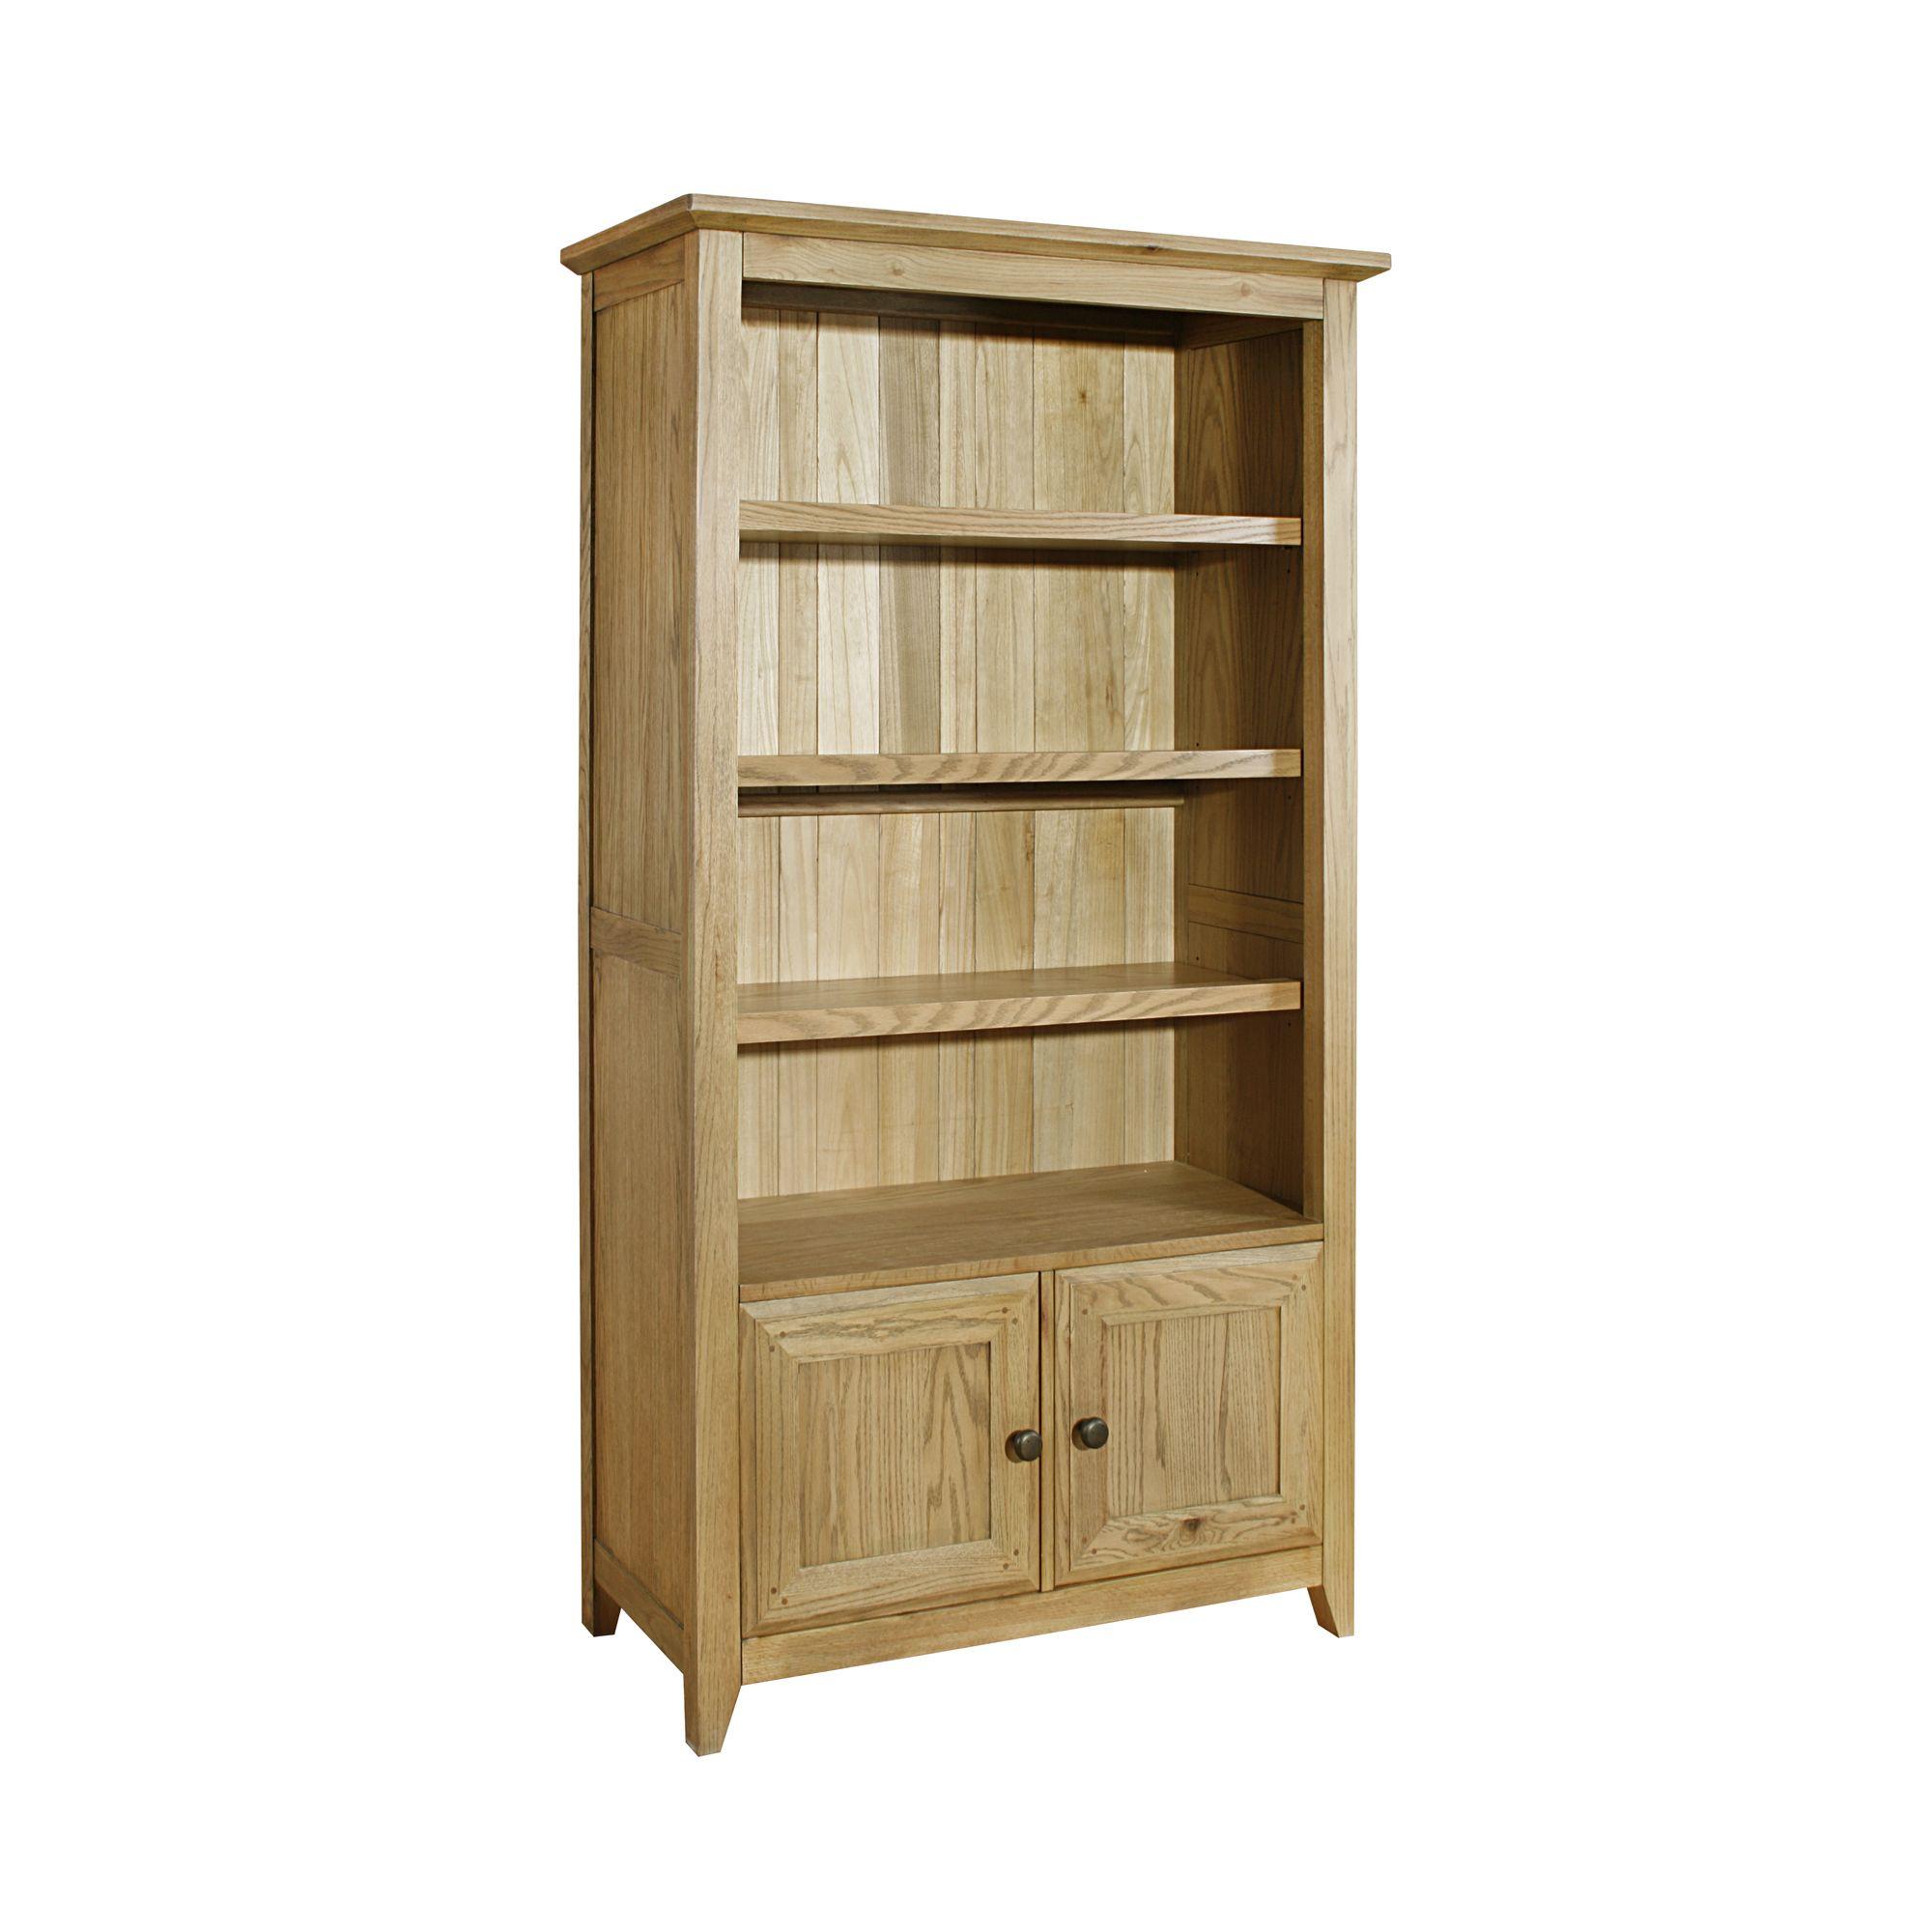 Alterton Furniture Mississippi Small Bookcase at Tesco Direct